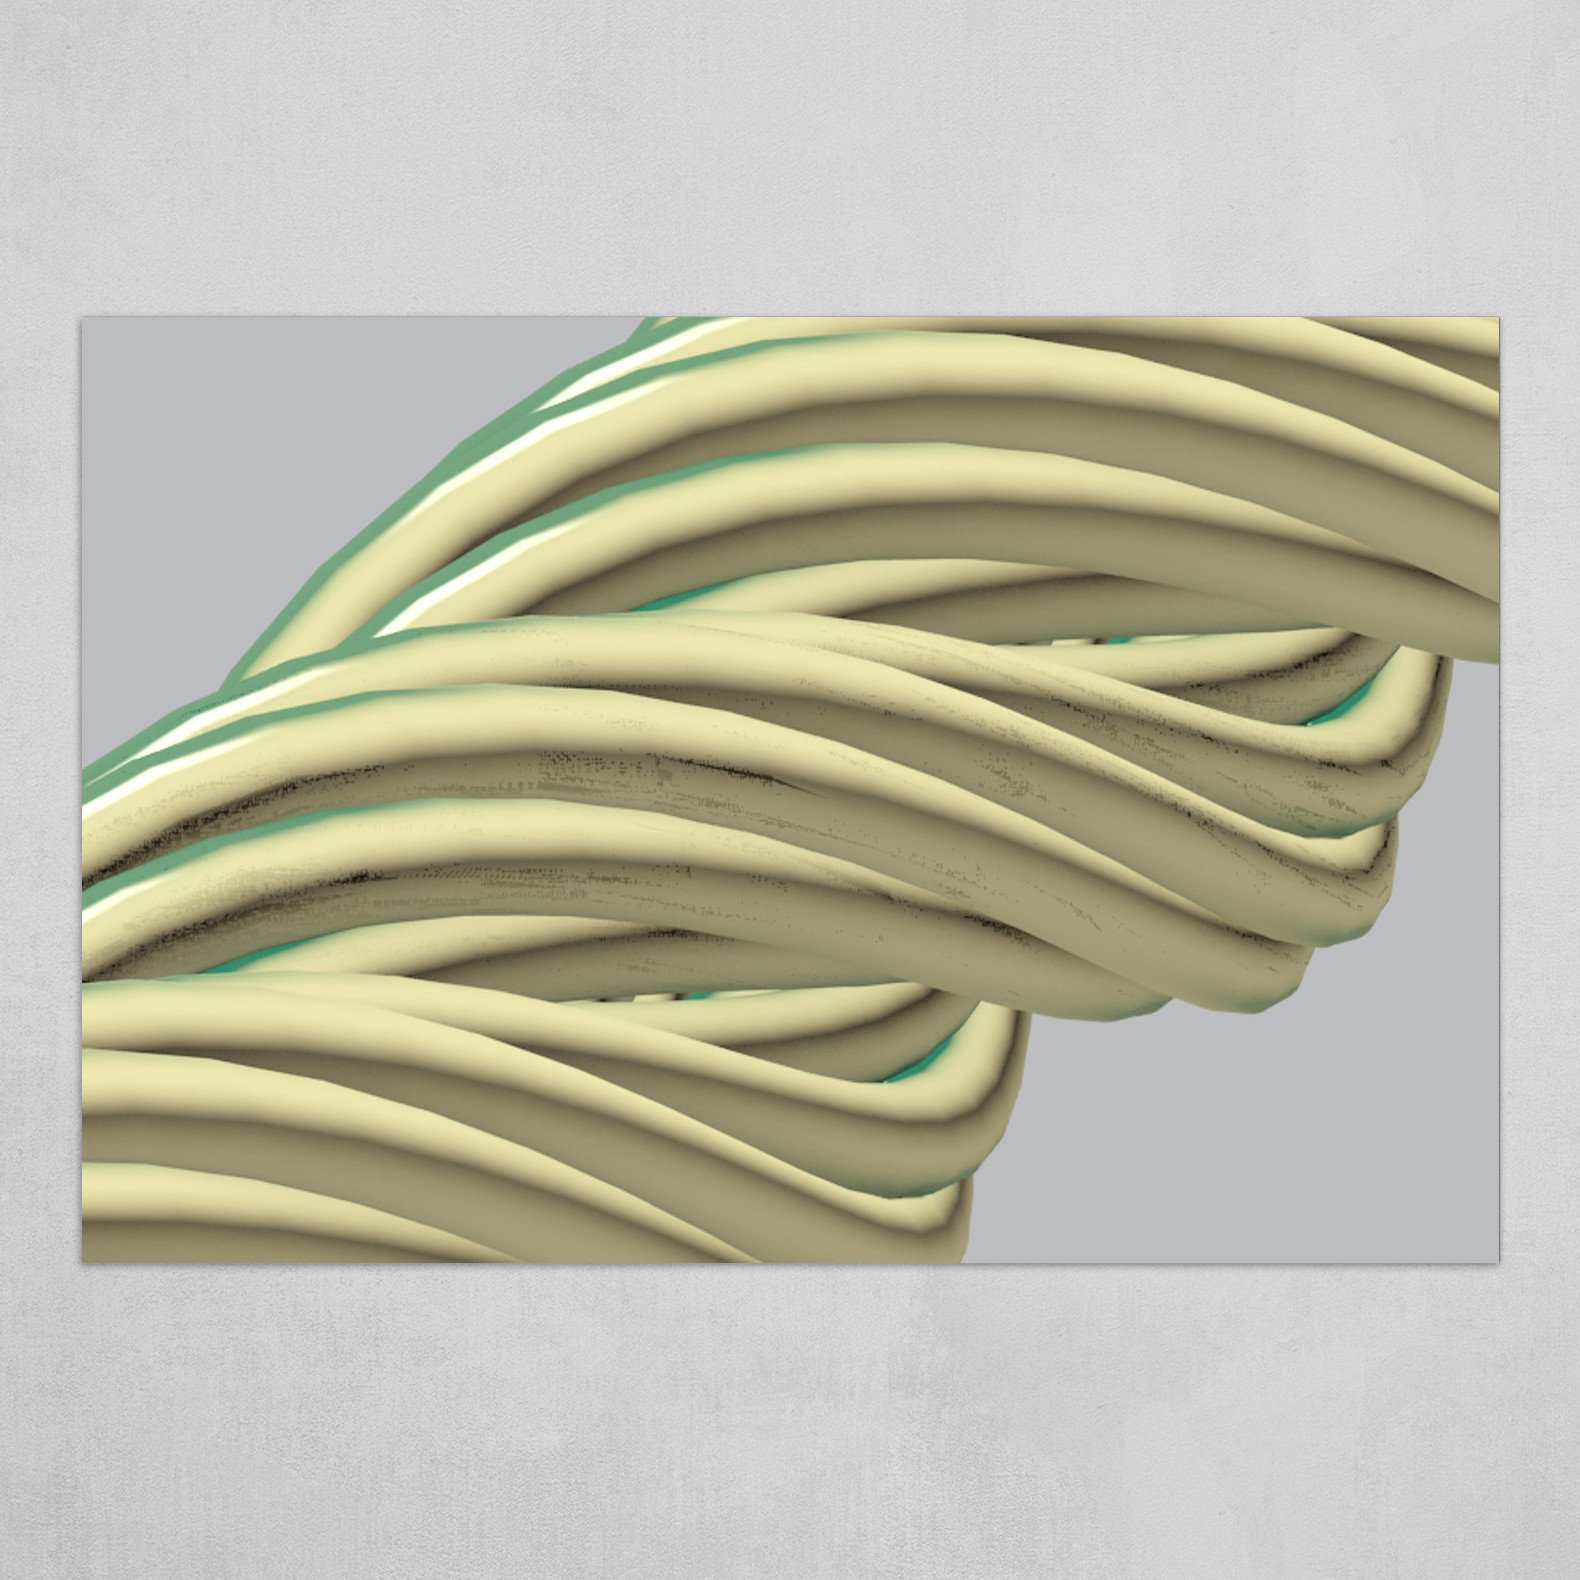 Cane rope